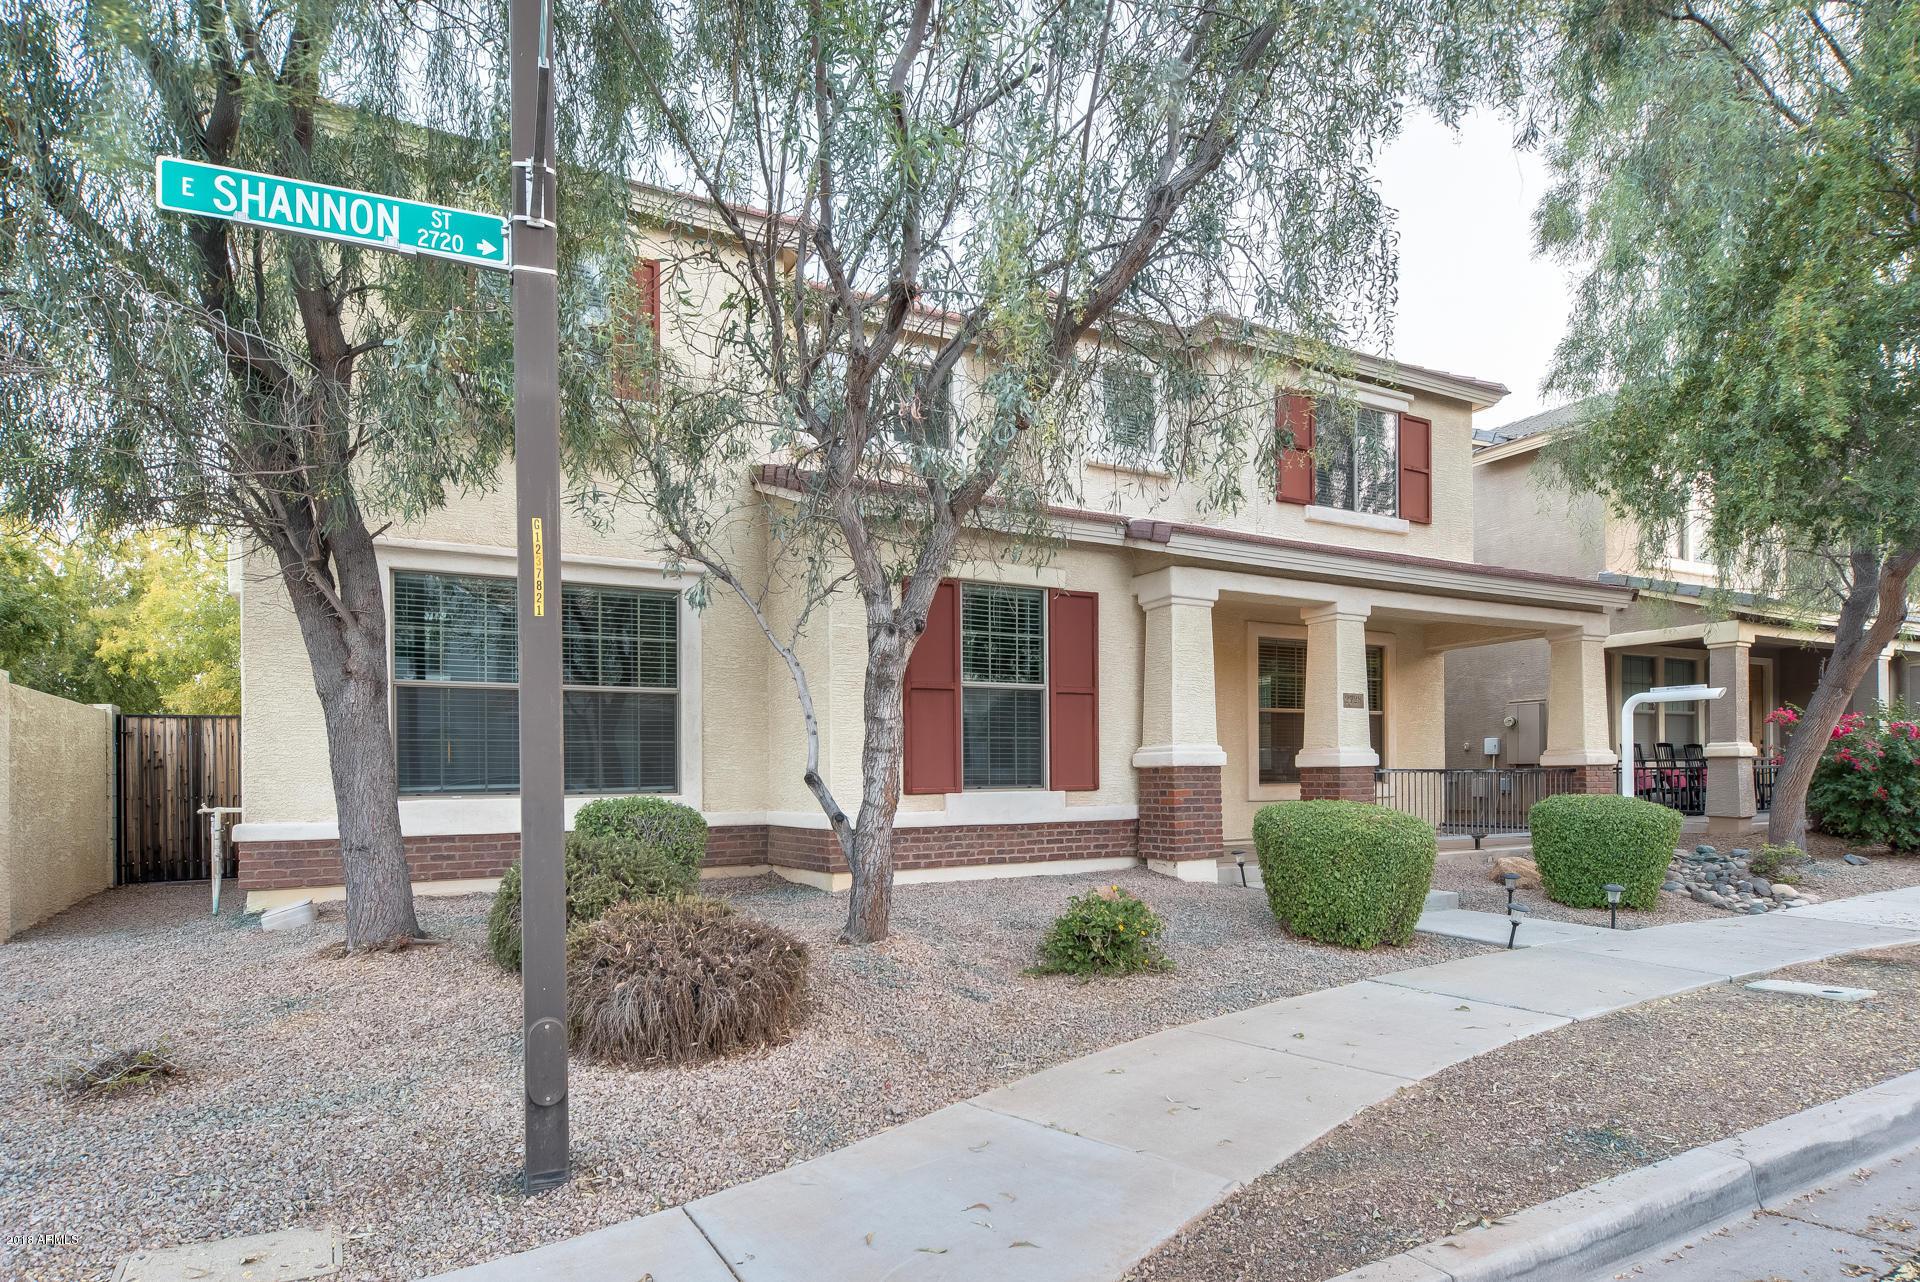 Photo of 2728 E SHANNON Street, Gilbert, AZ 85295